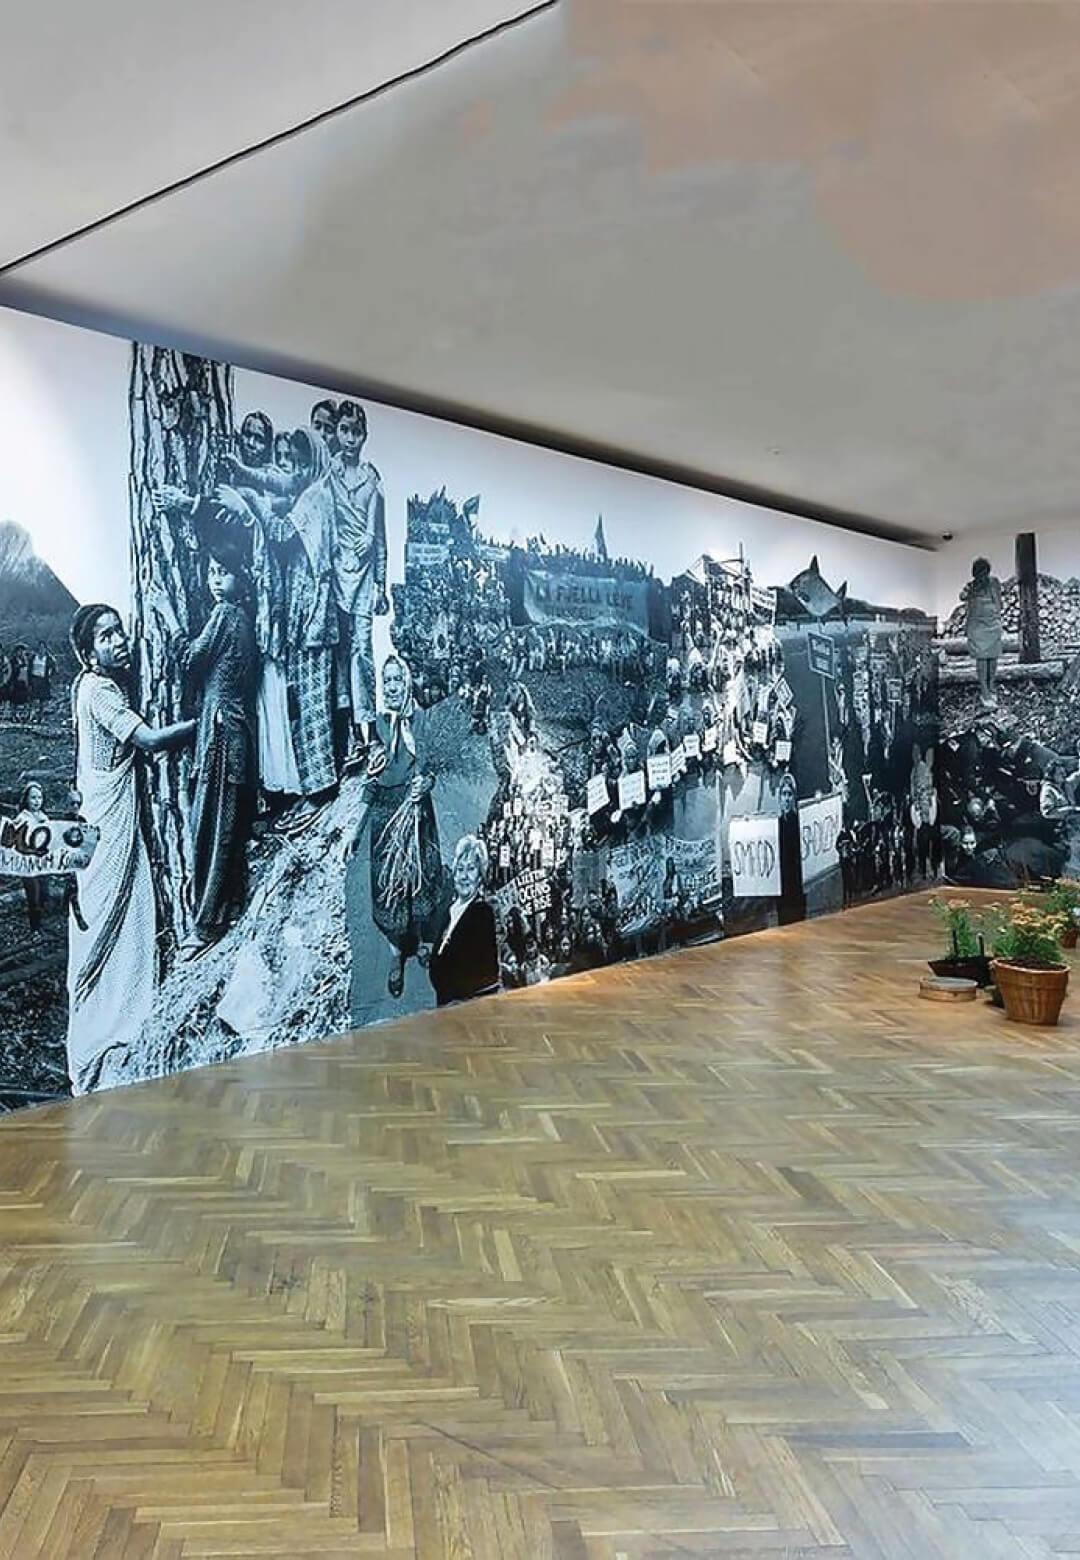 Care Report Mural, Installation view at Muzeum Sztuki, Lodz, Poland | Carolina Caycedo | STIRworld